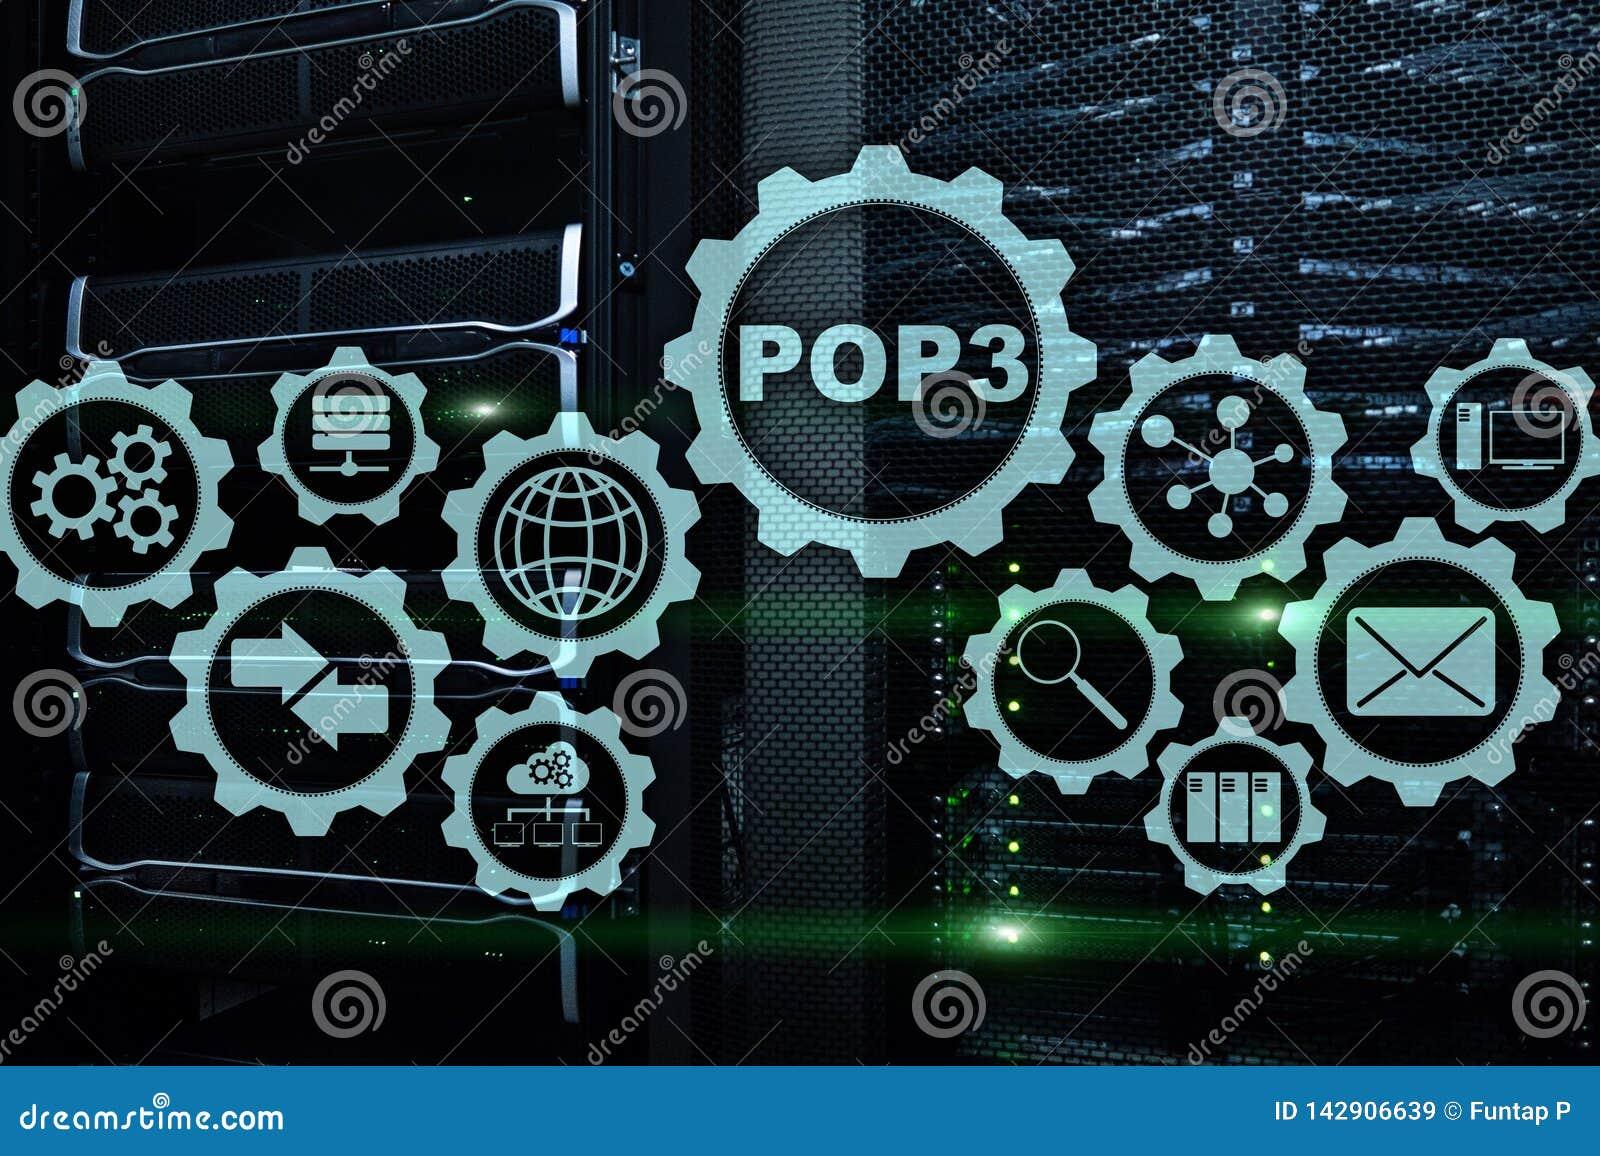 POP3 Stolpe - kontorsprotokollversion 3 Standart Internet Protocol på datacenterbakgrund